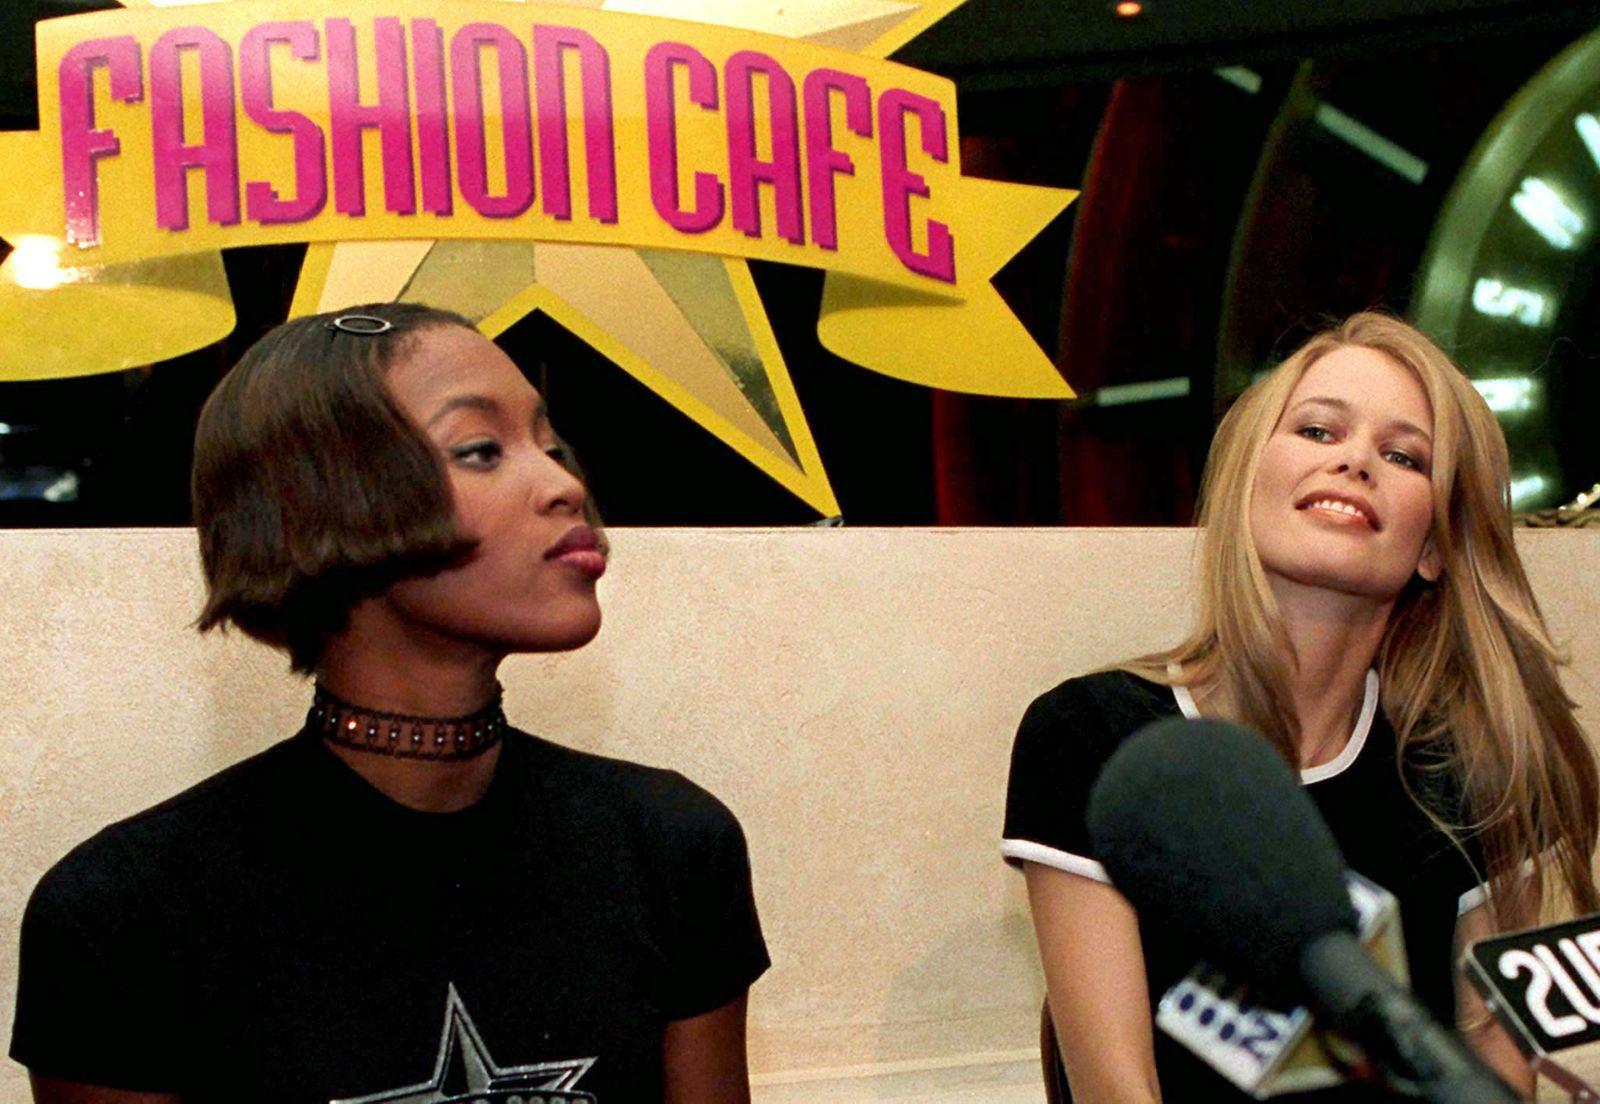 Fashion Café / Restaurant